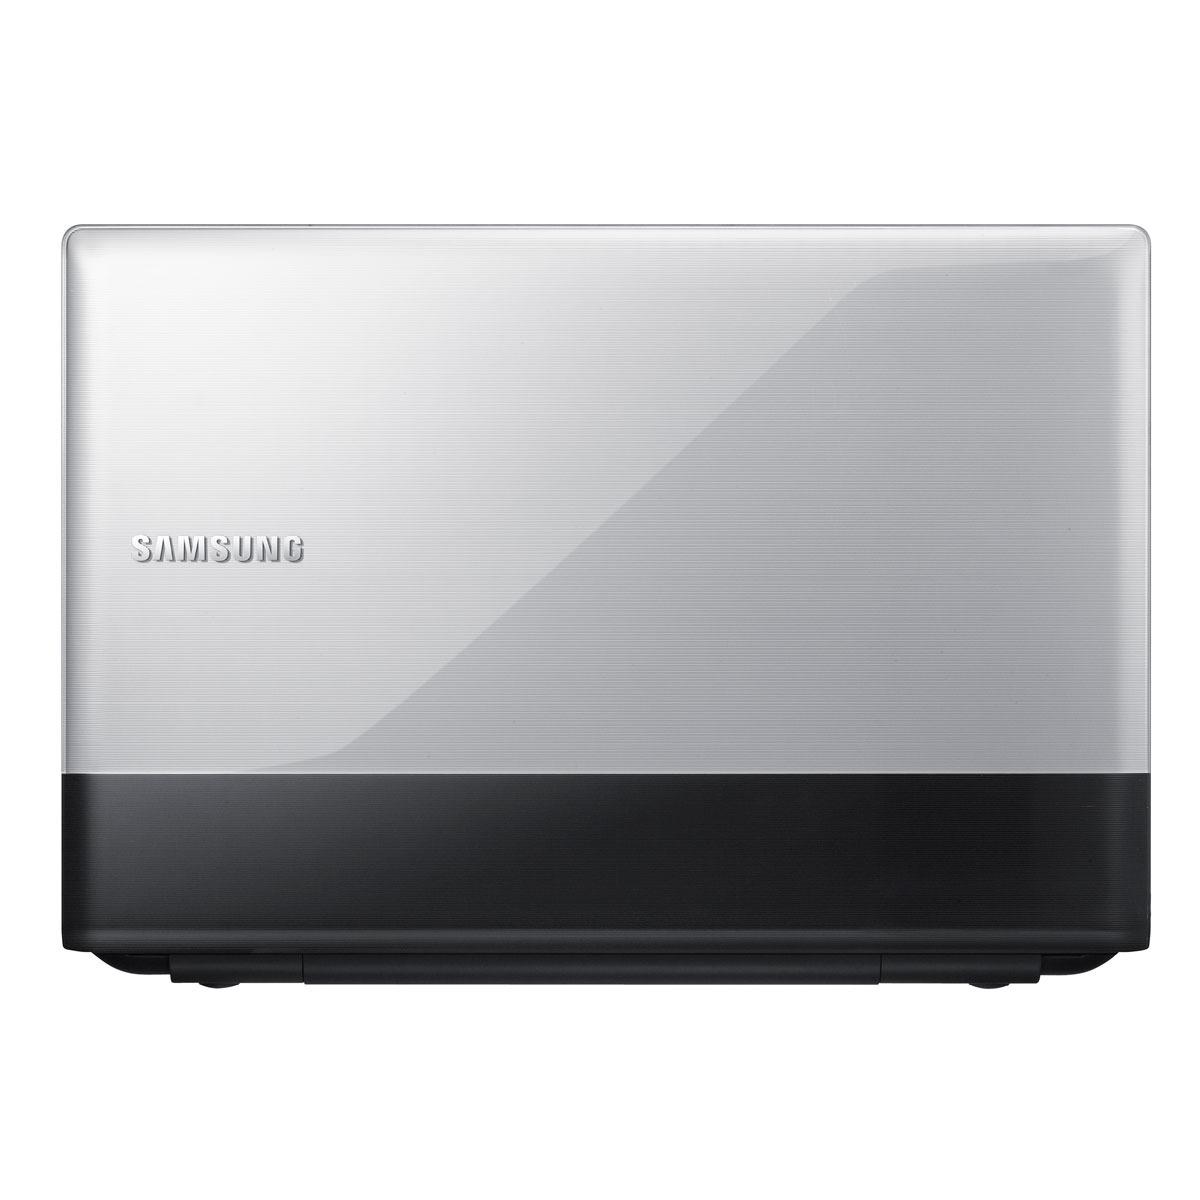 "PC portable Samsung RV511 E7P-C3380 Samsung RV511 E7P-C3380 - Intel Core i3-380M 4 Go 500 Go 15.6"" LED NVIDIA GeForce 315M Graveur DVD Wi-Fi N/Bluetooth Webcam Windows 7 Premium 64 bits"